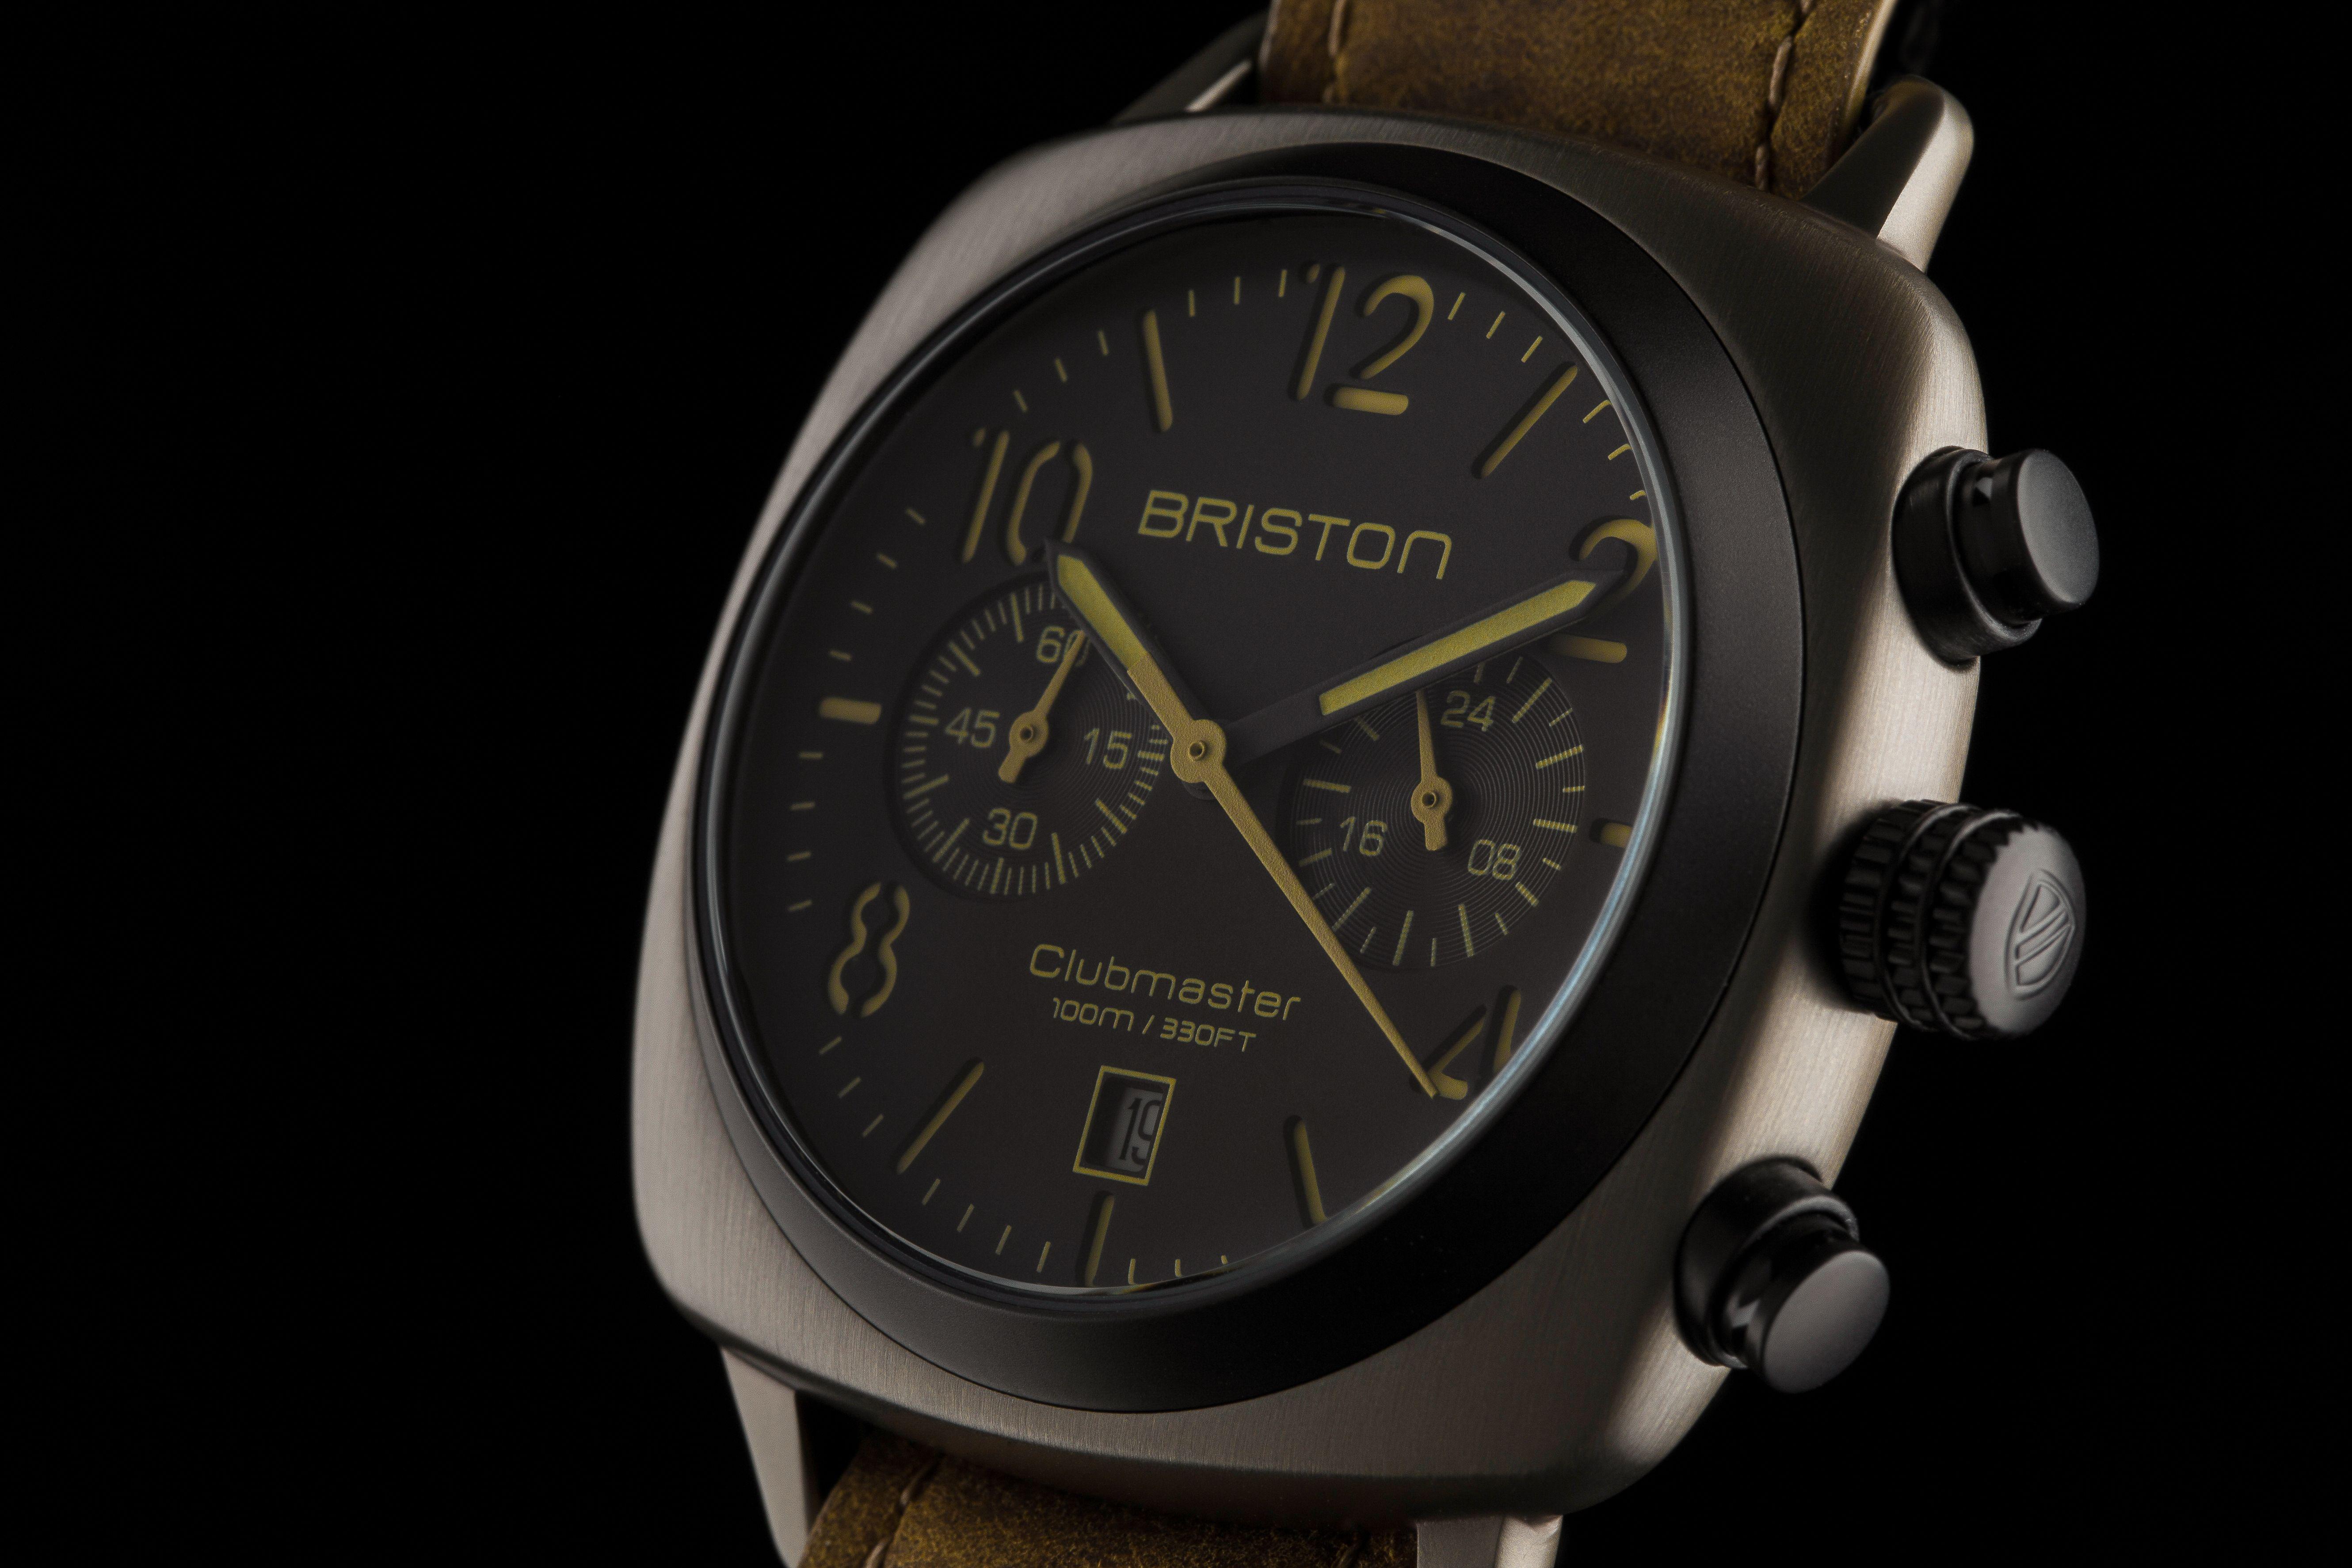 Clubmaster Classic Steel Chronograph Khaki - Briston watches ©Pierre Le targat